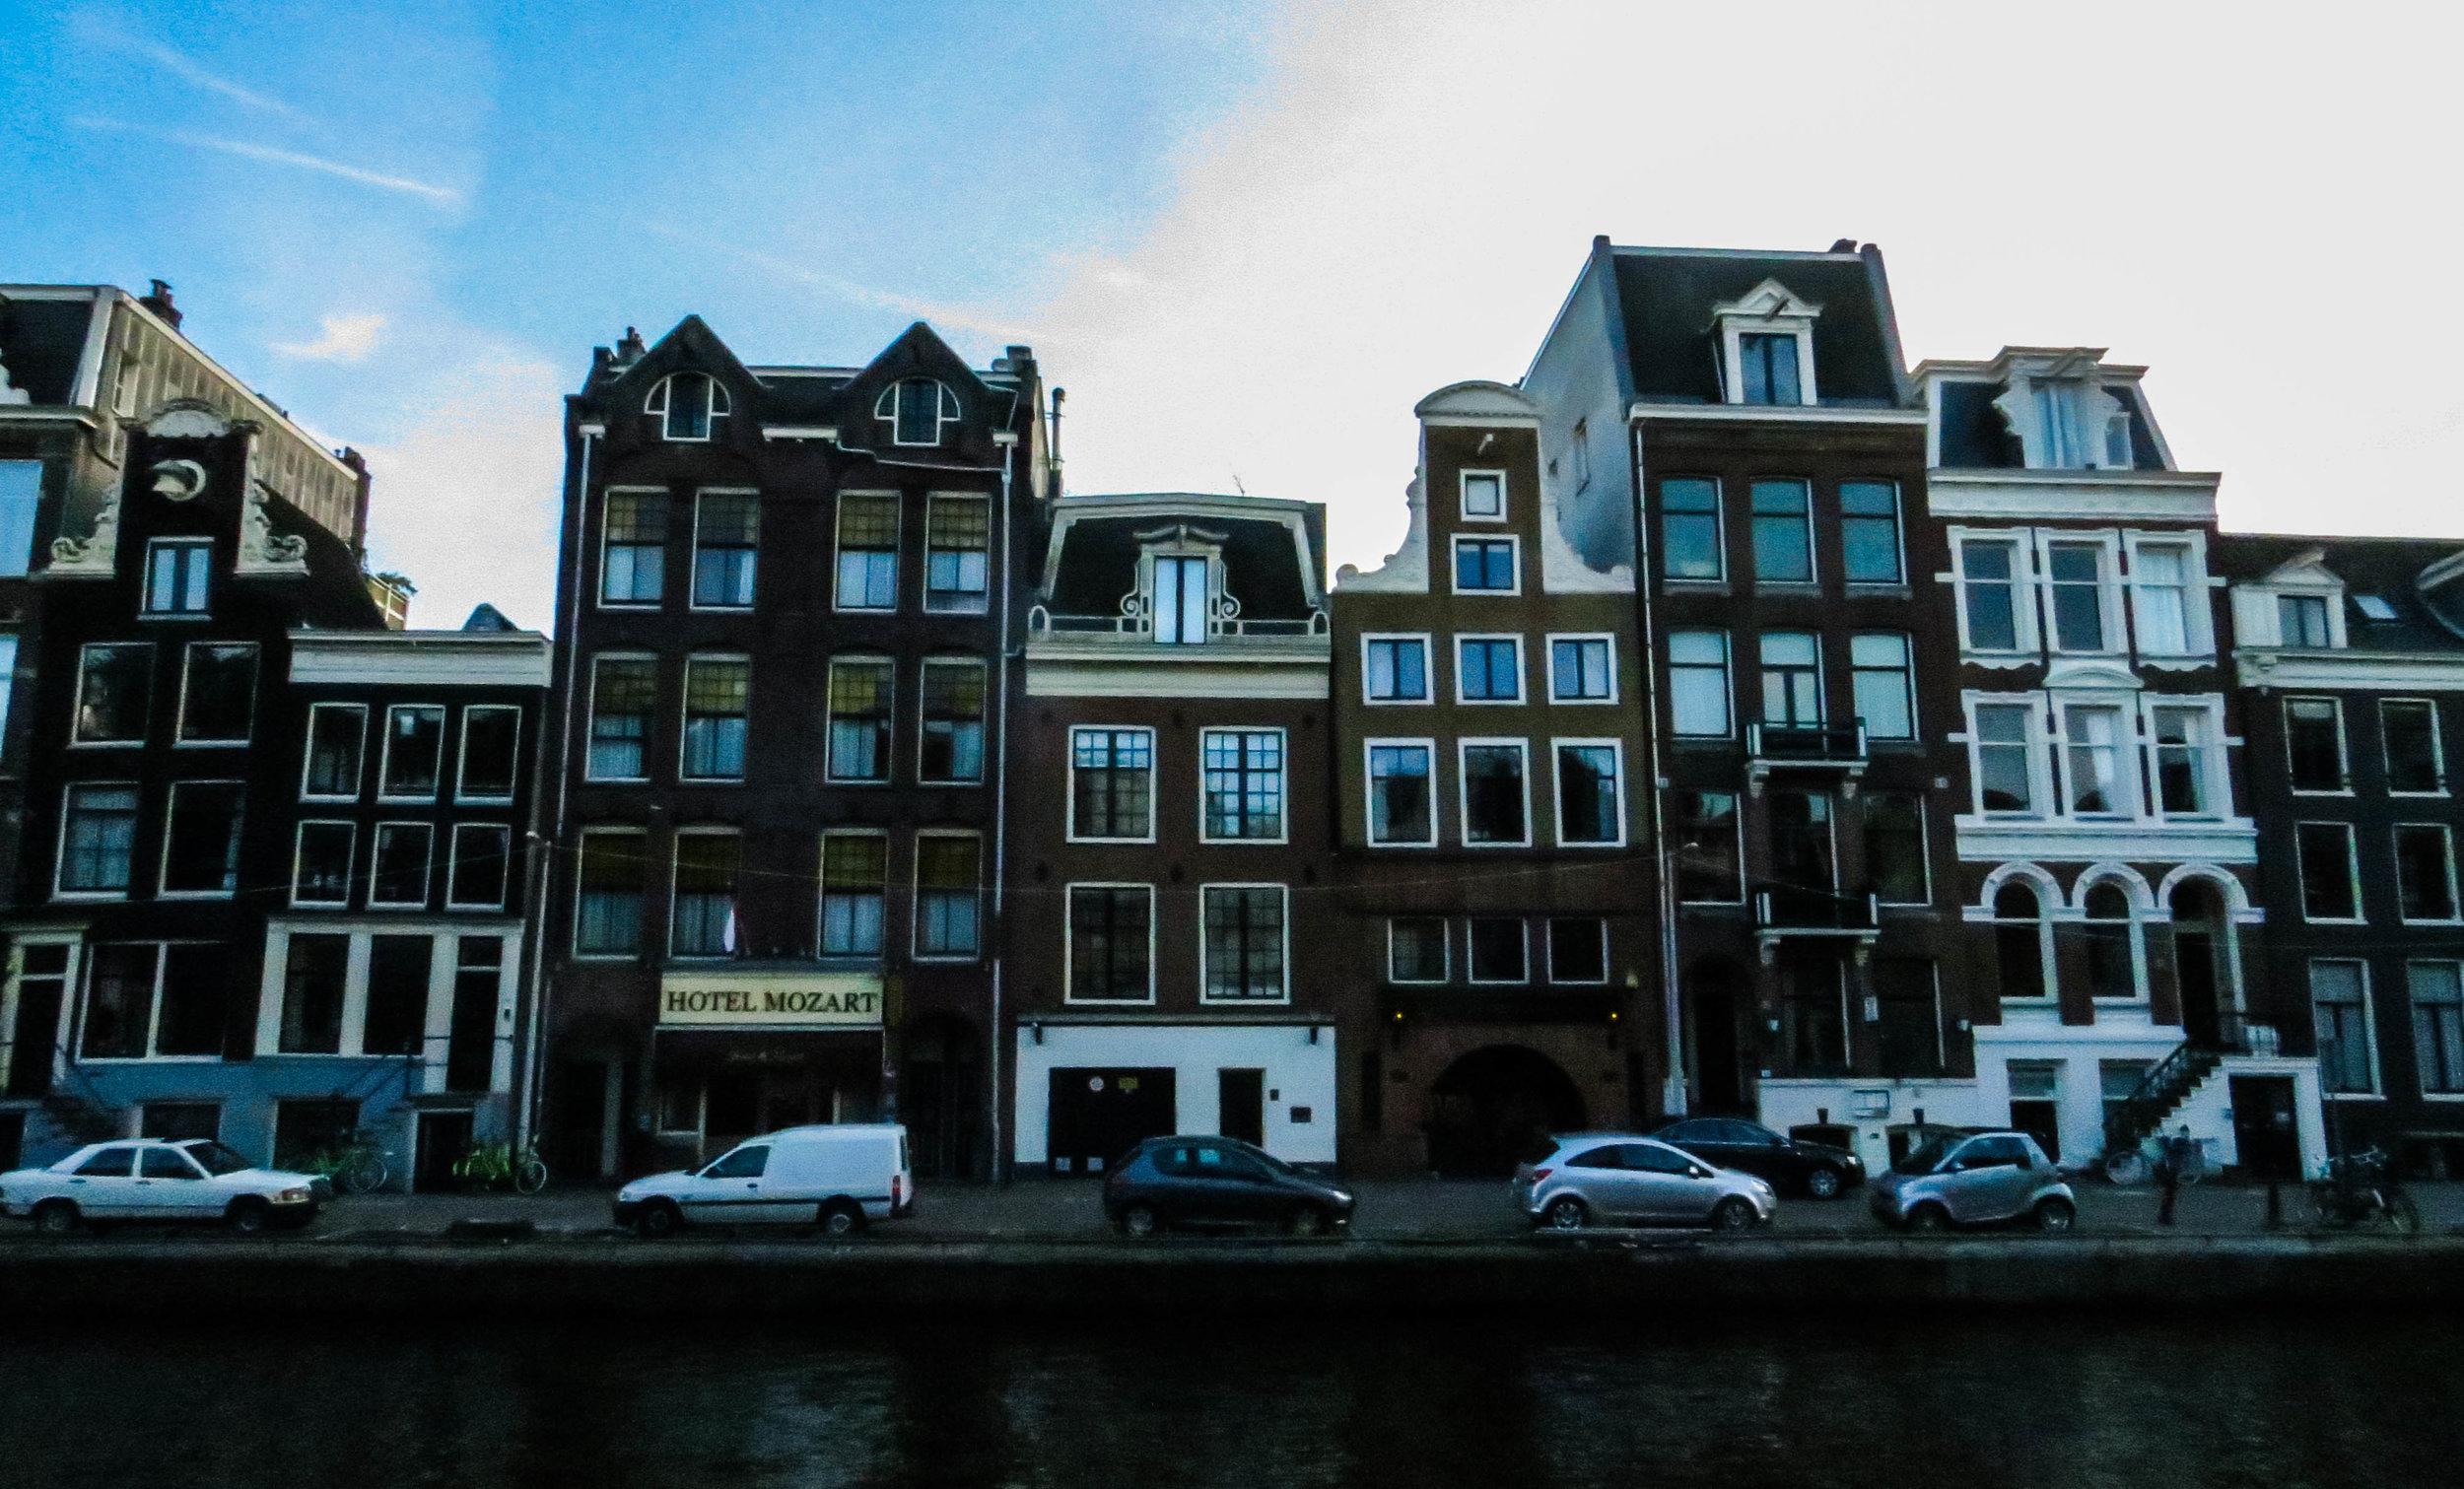 amsterdam-netherlands-street-photography-42.jpg